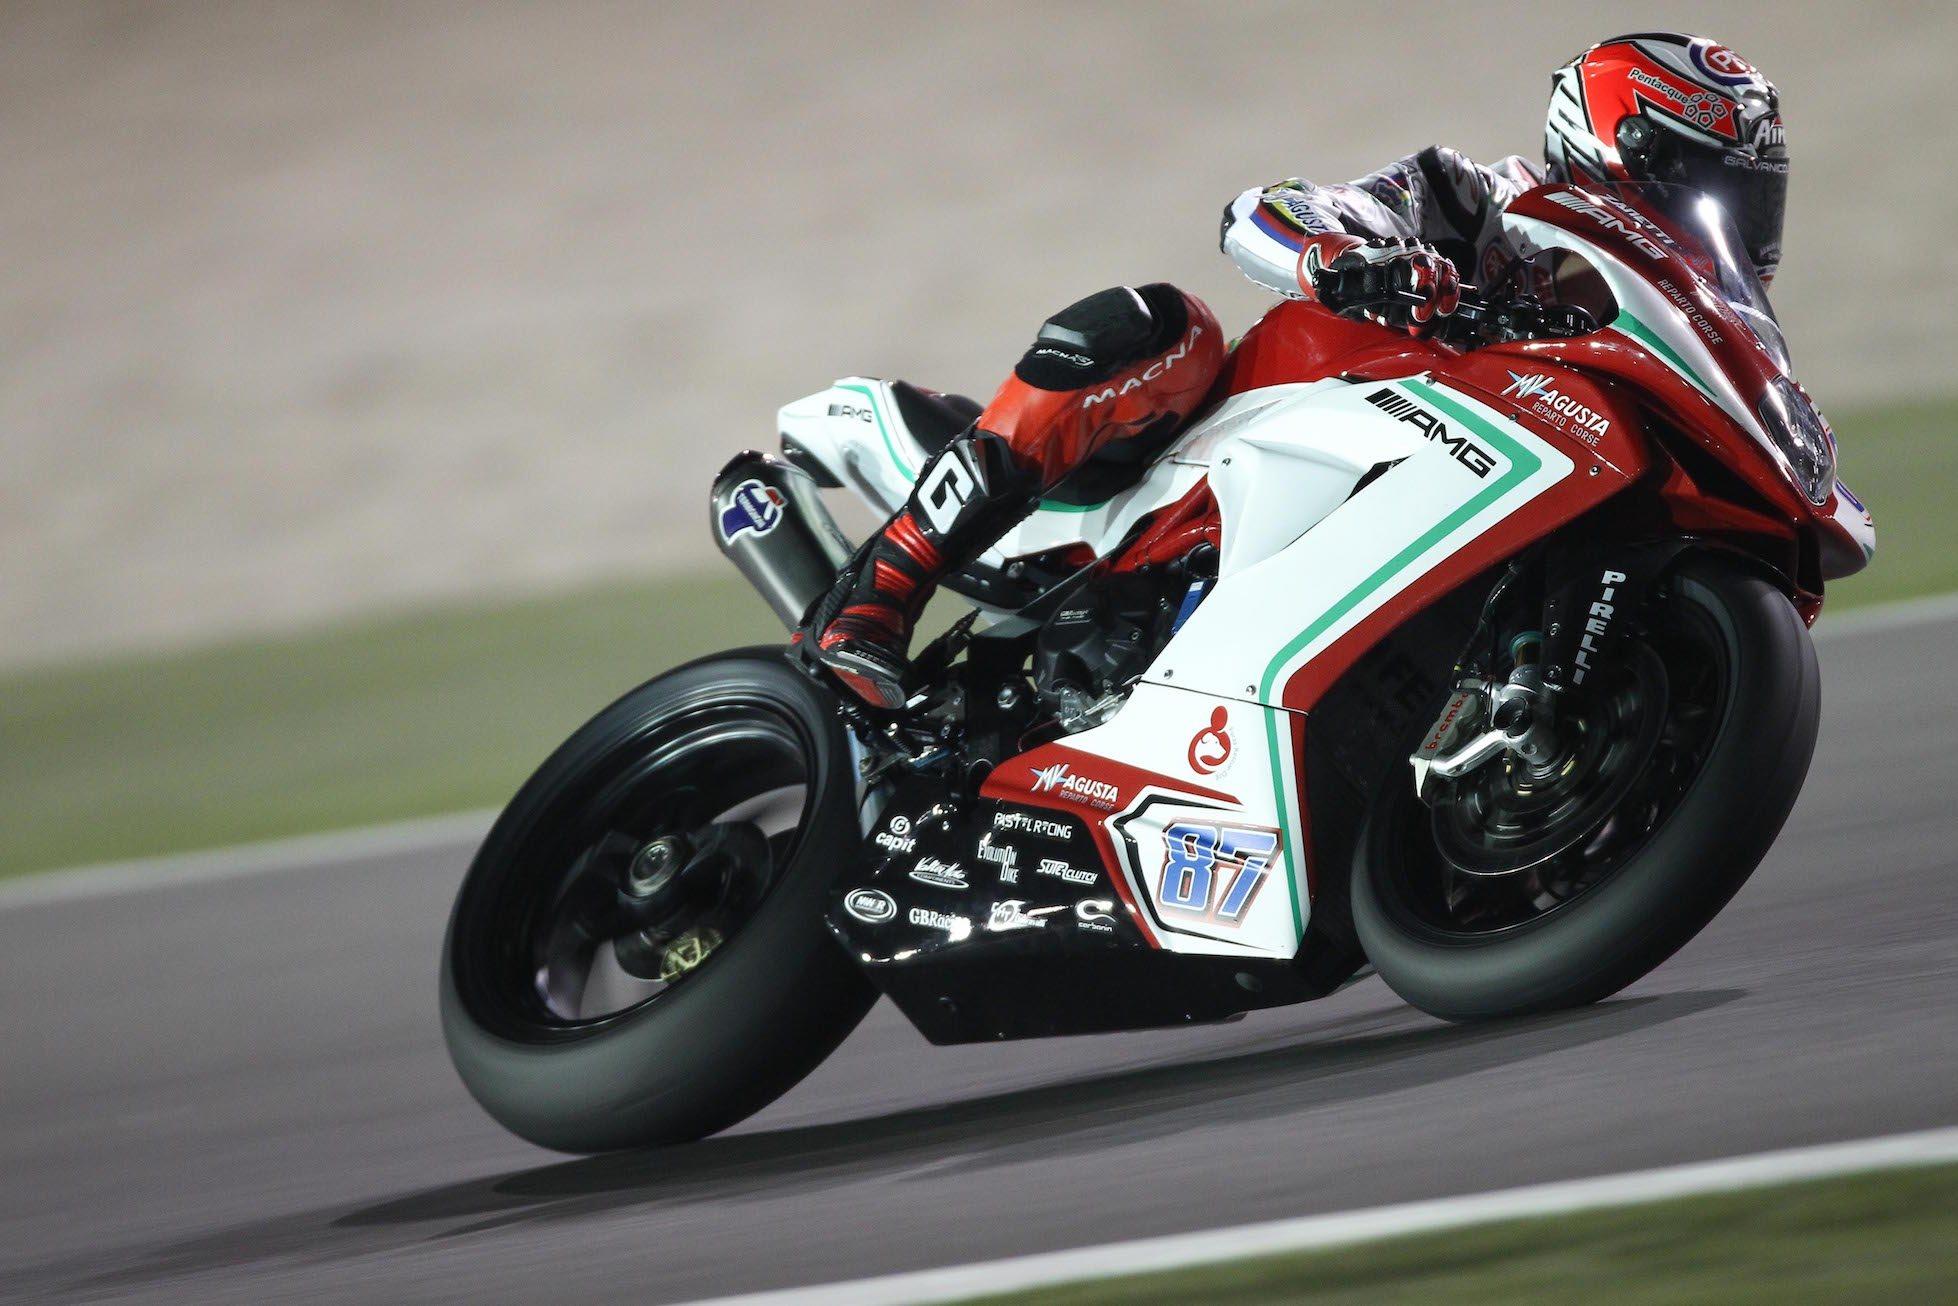 Superbike-Wm